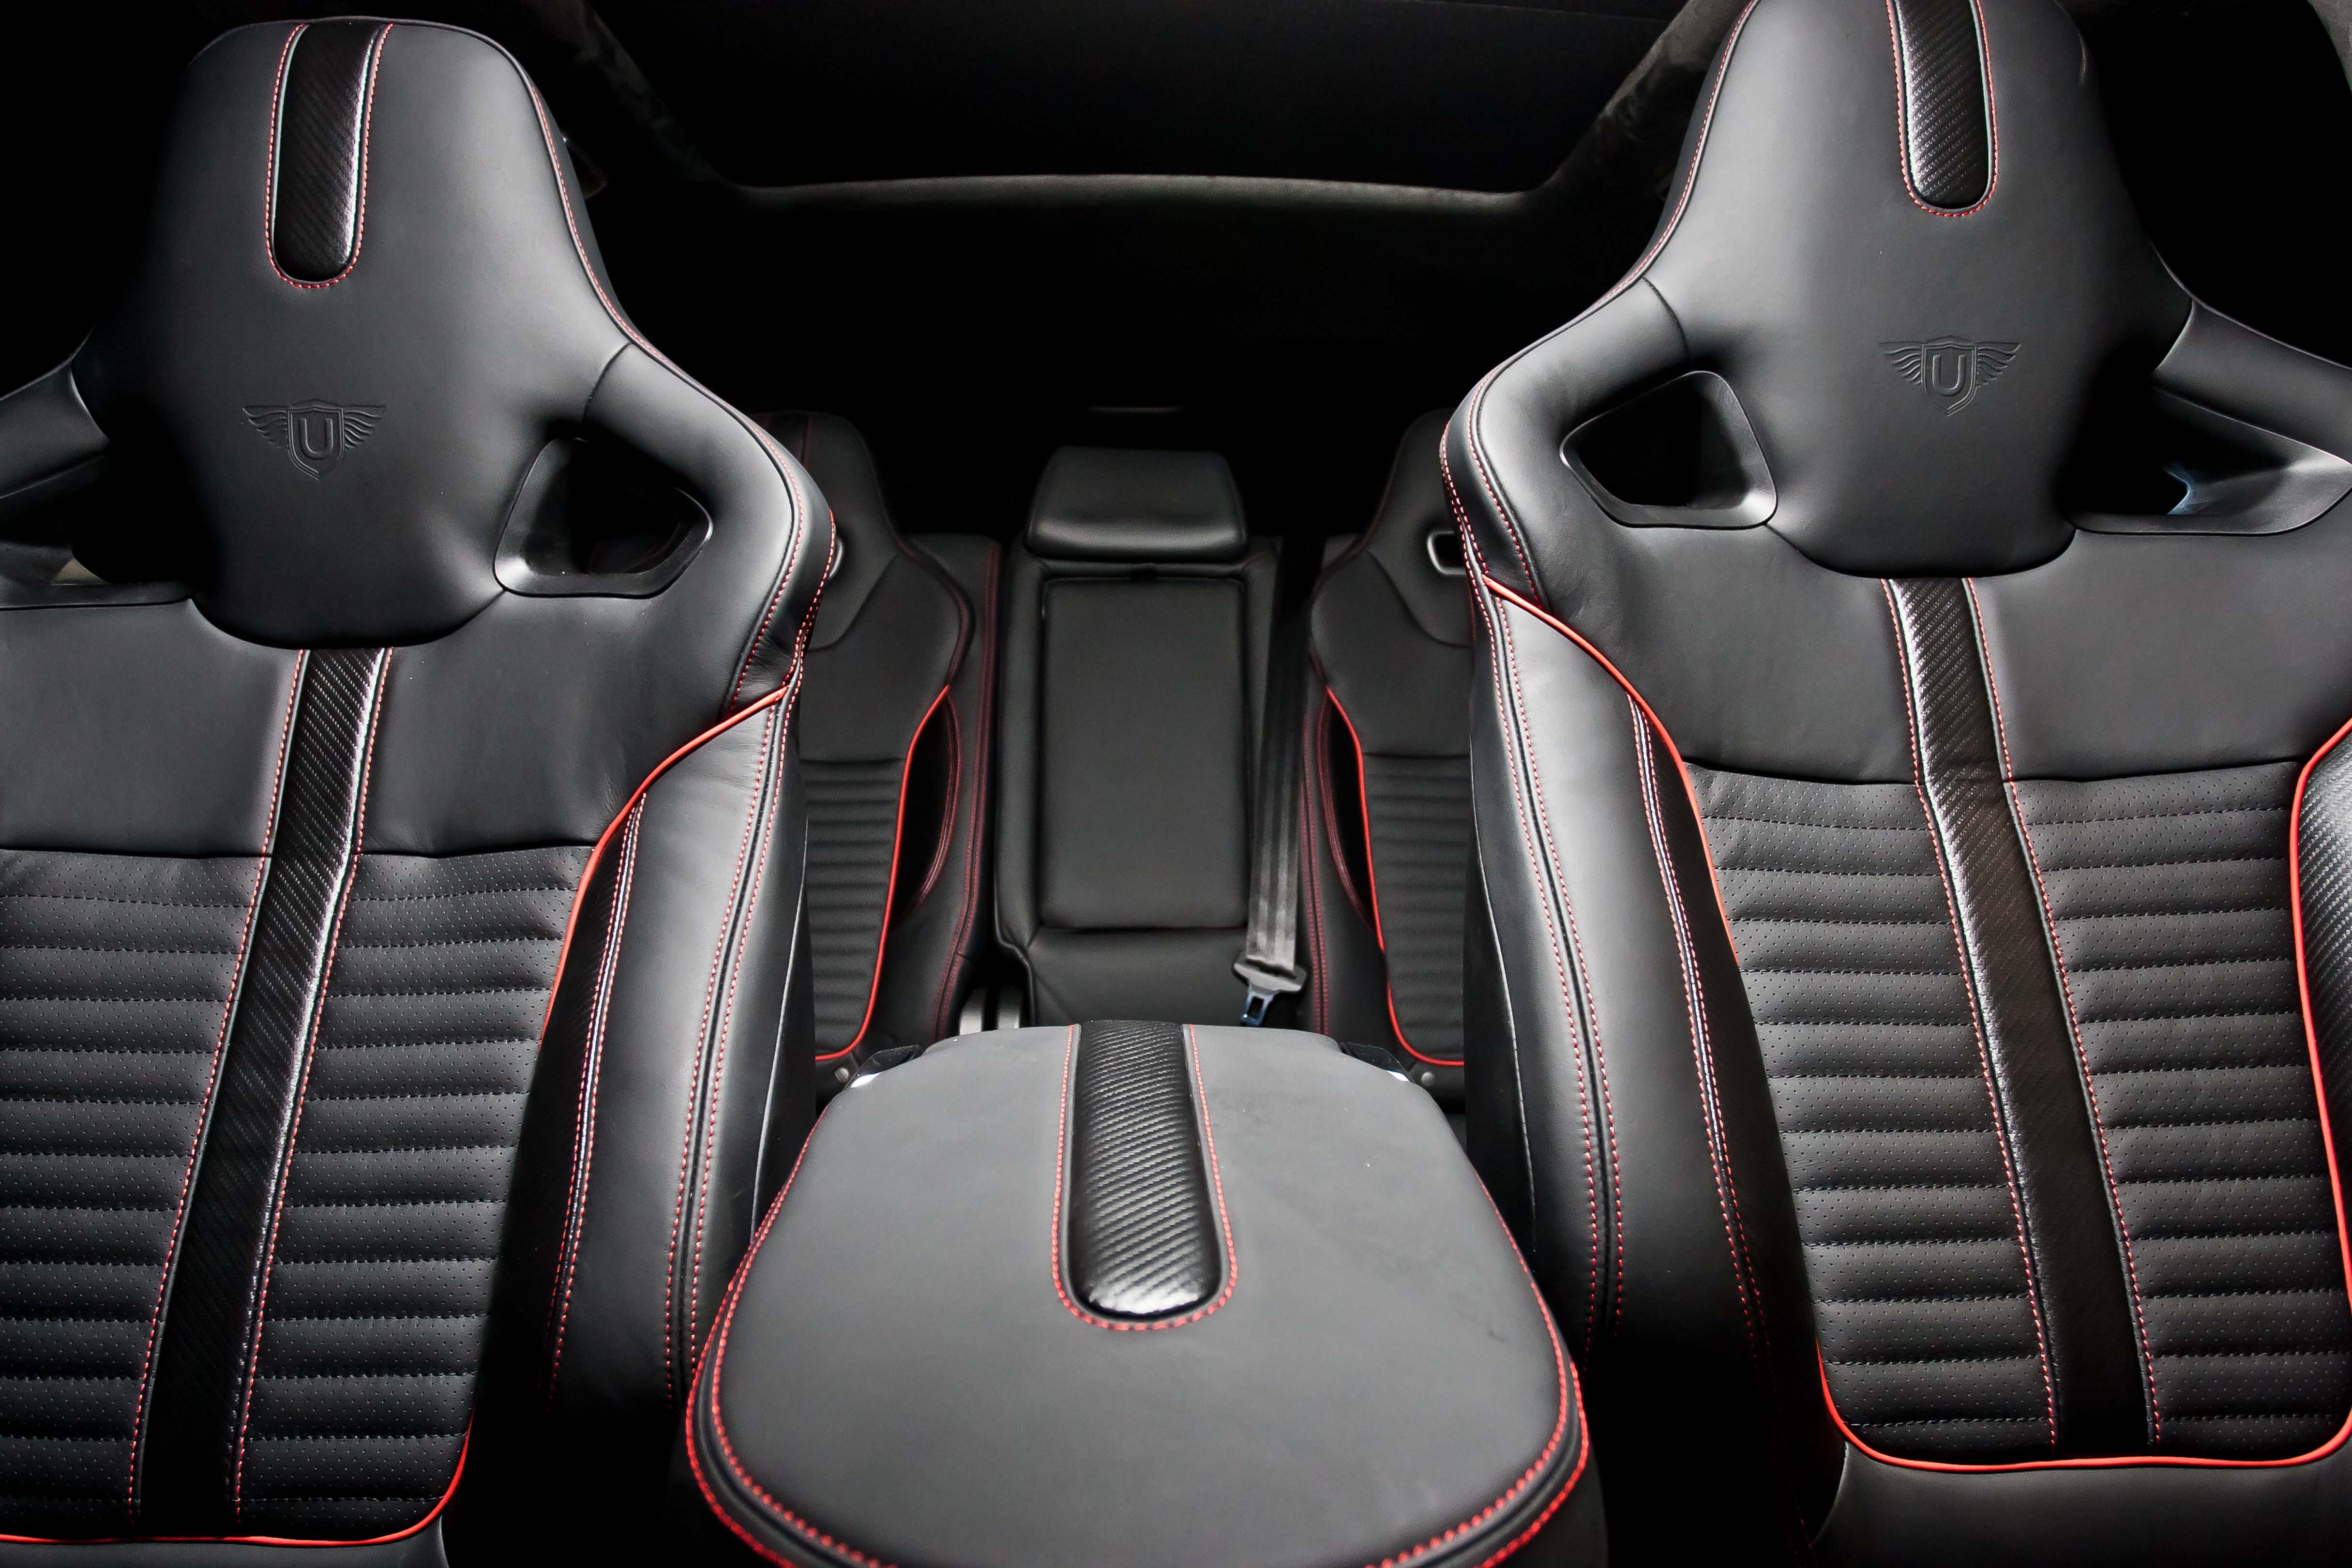 SVR Carbon Bespoke Leather Interior46